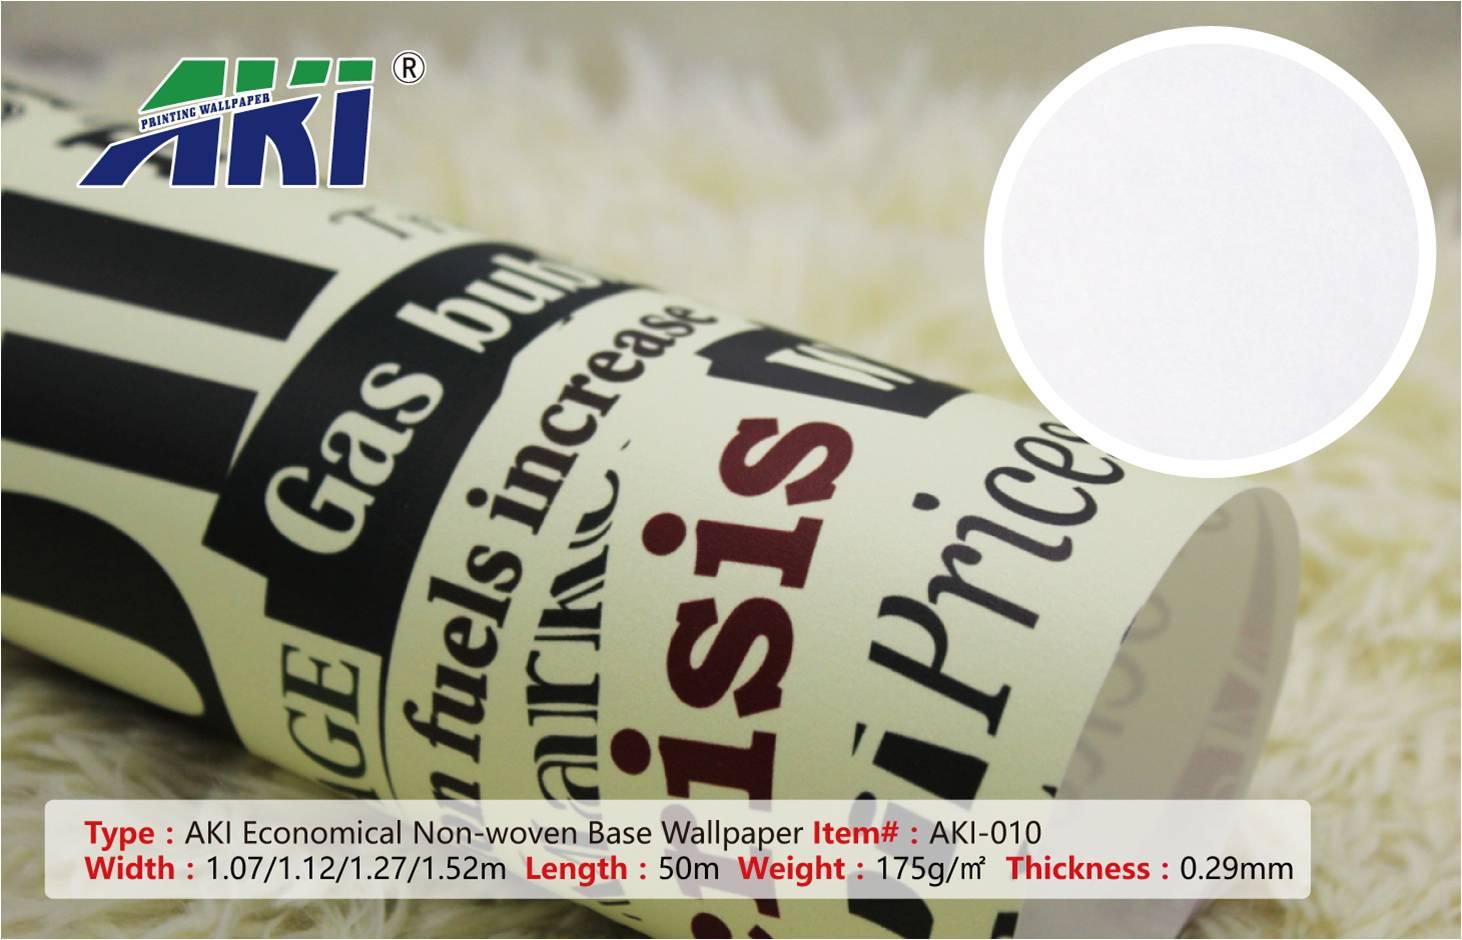 Wall Paper for Room AKI 010 Economical Non-Woven Digital PVC Texture Printable Wallpaper